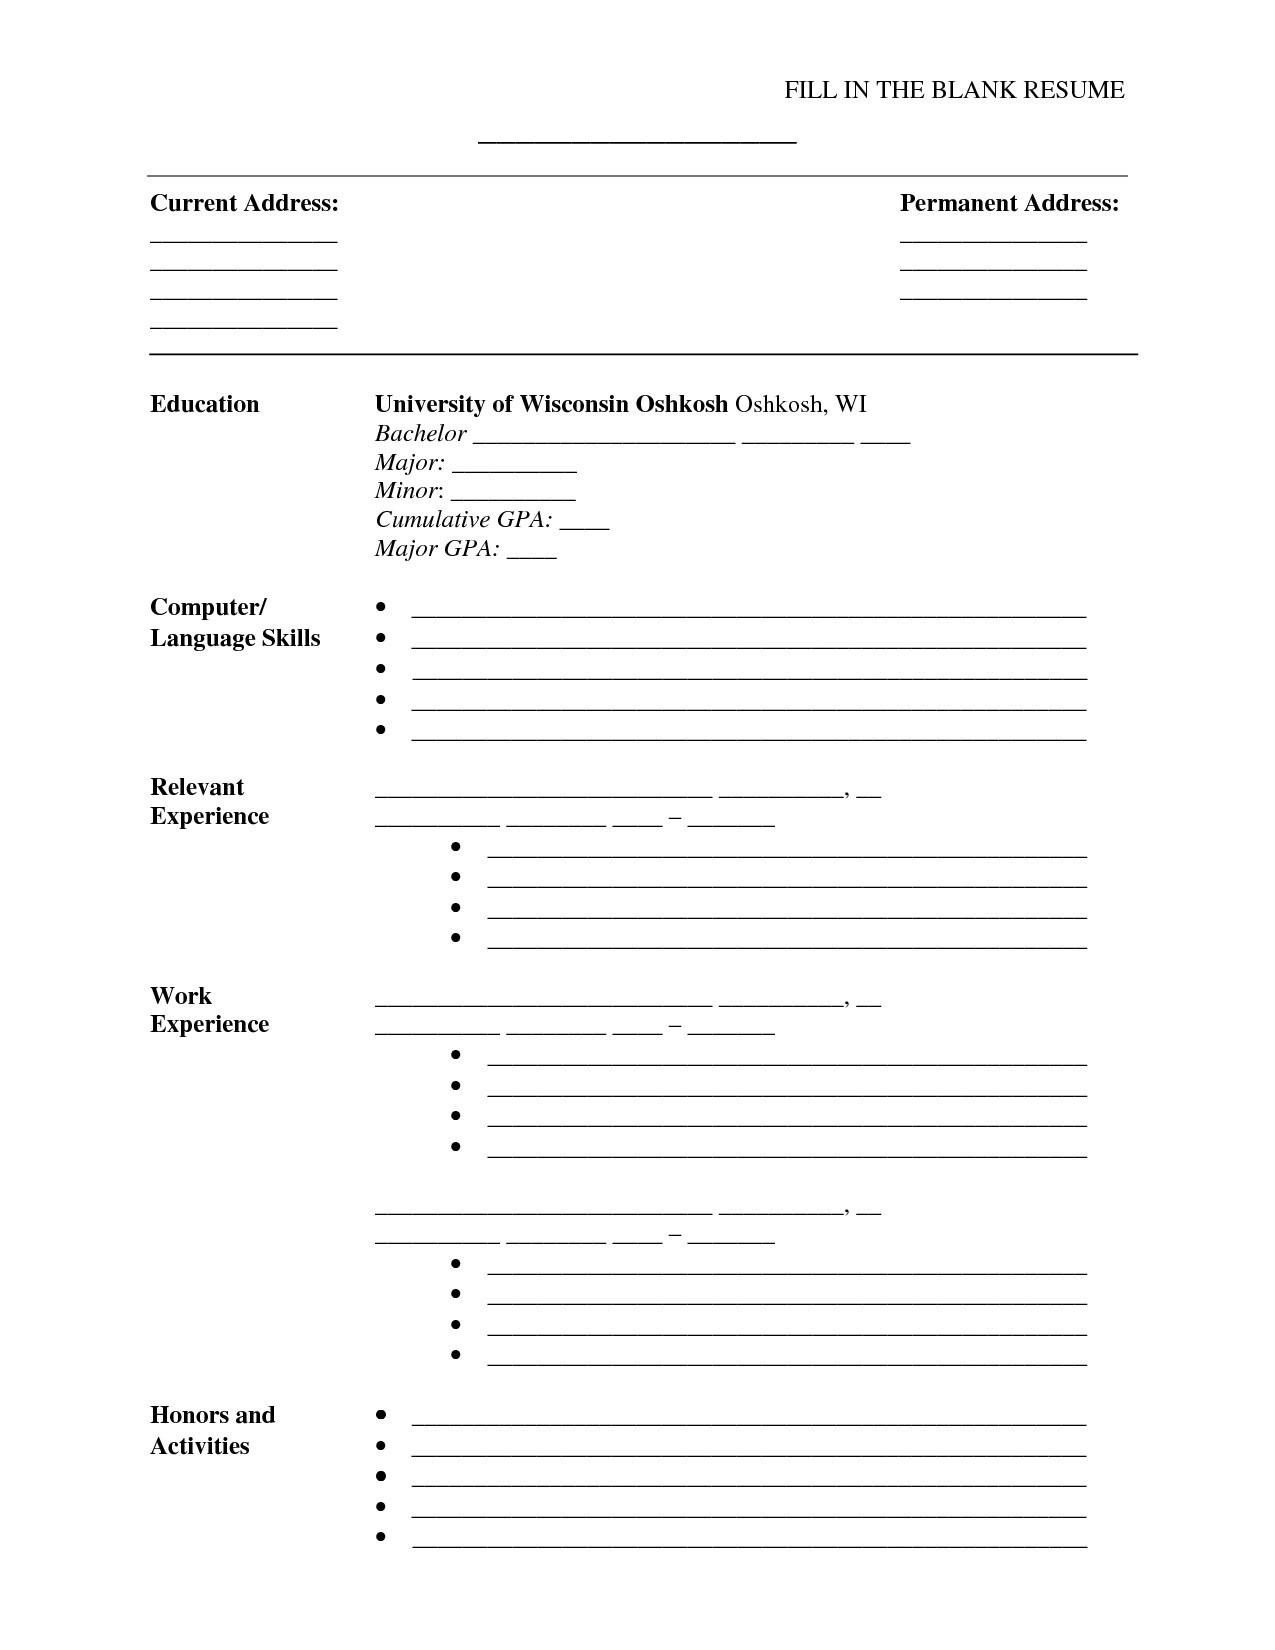 Resume Templates Blank